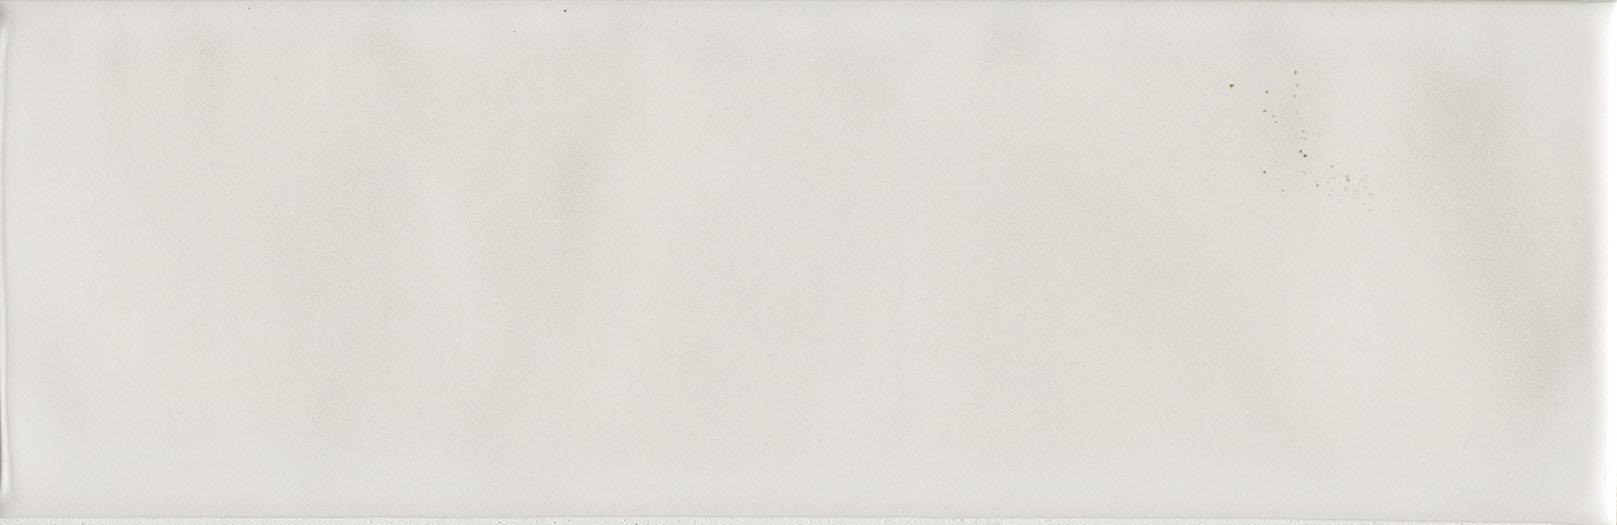 0190937, Brick Inspiration, Valkoinen, seina